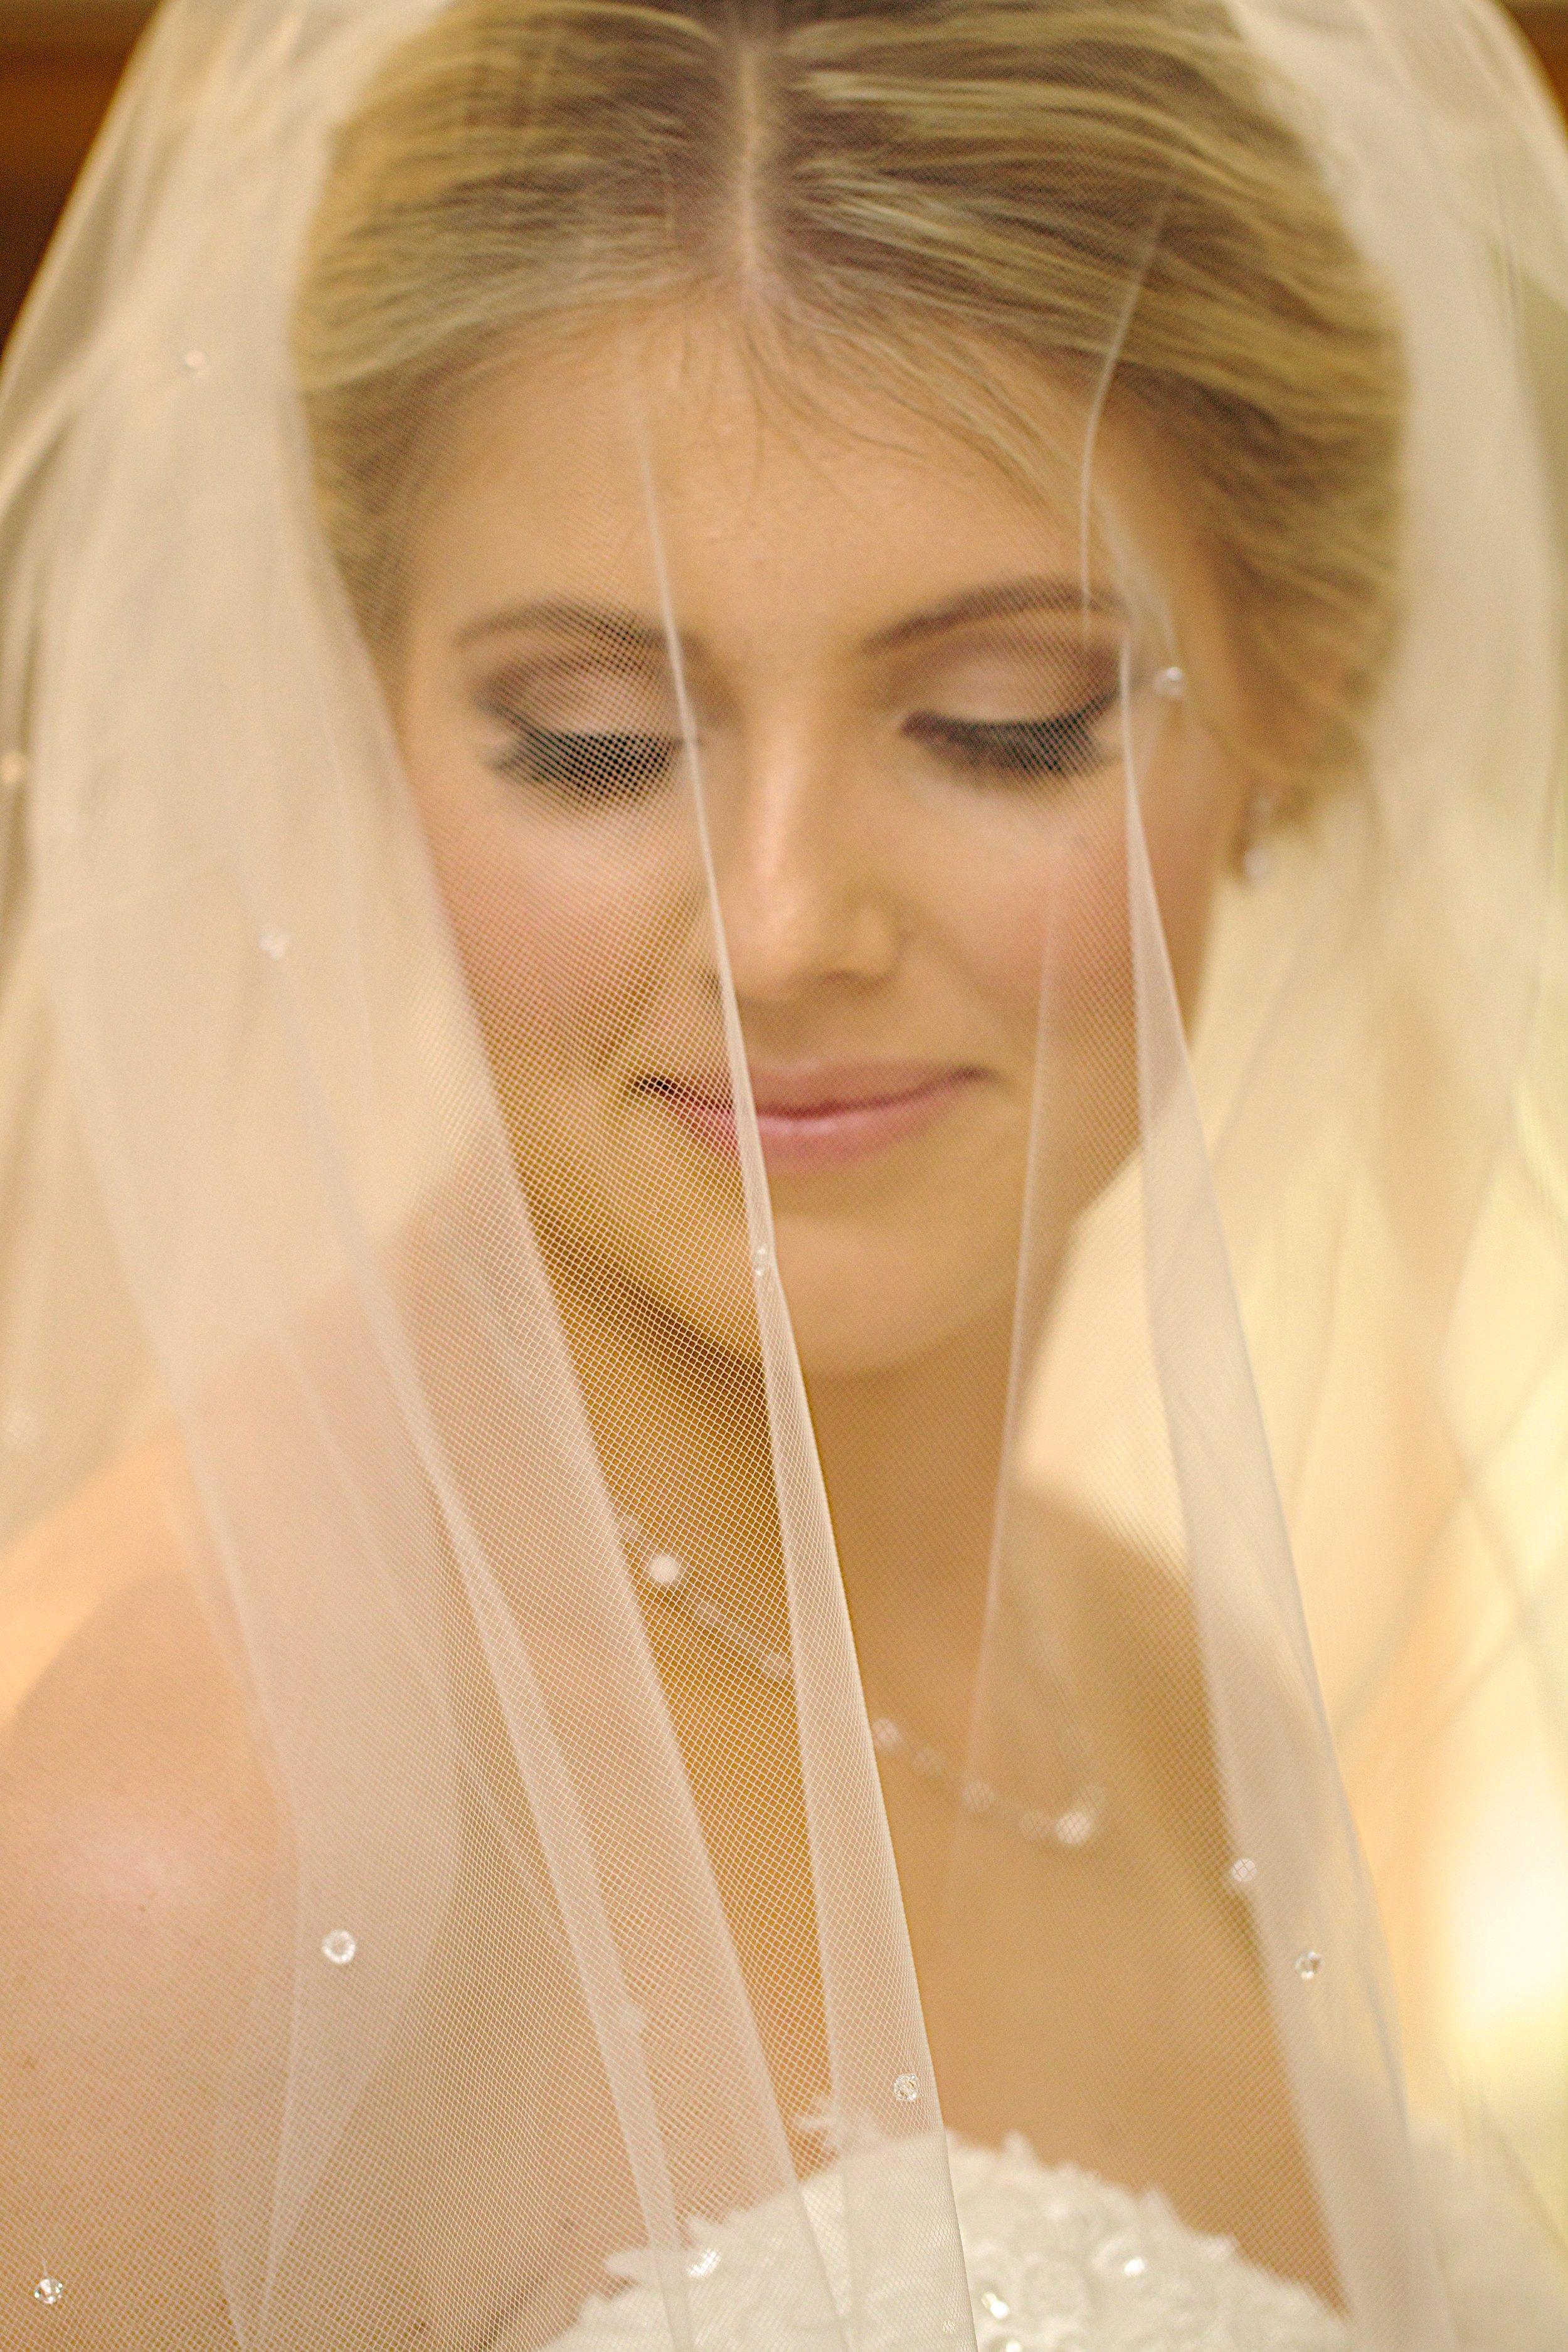 Sam_Doug_Anable_Wedding_Bride_Dressed_Ceremony_Congrats_Mark_130517